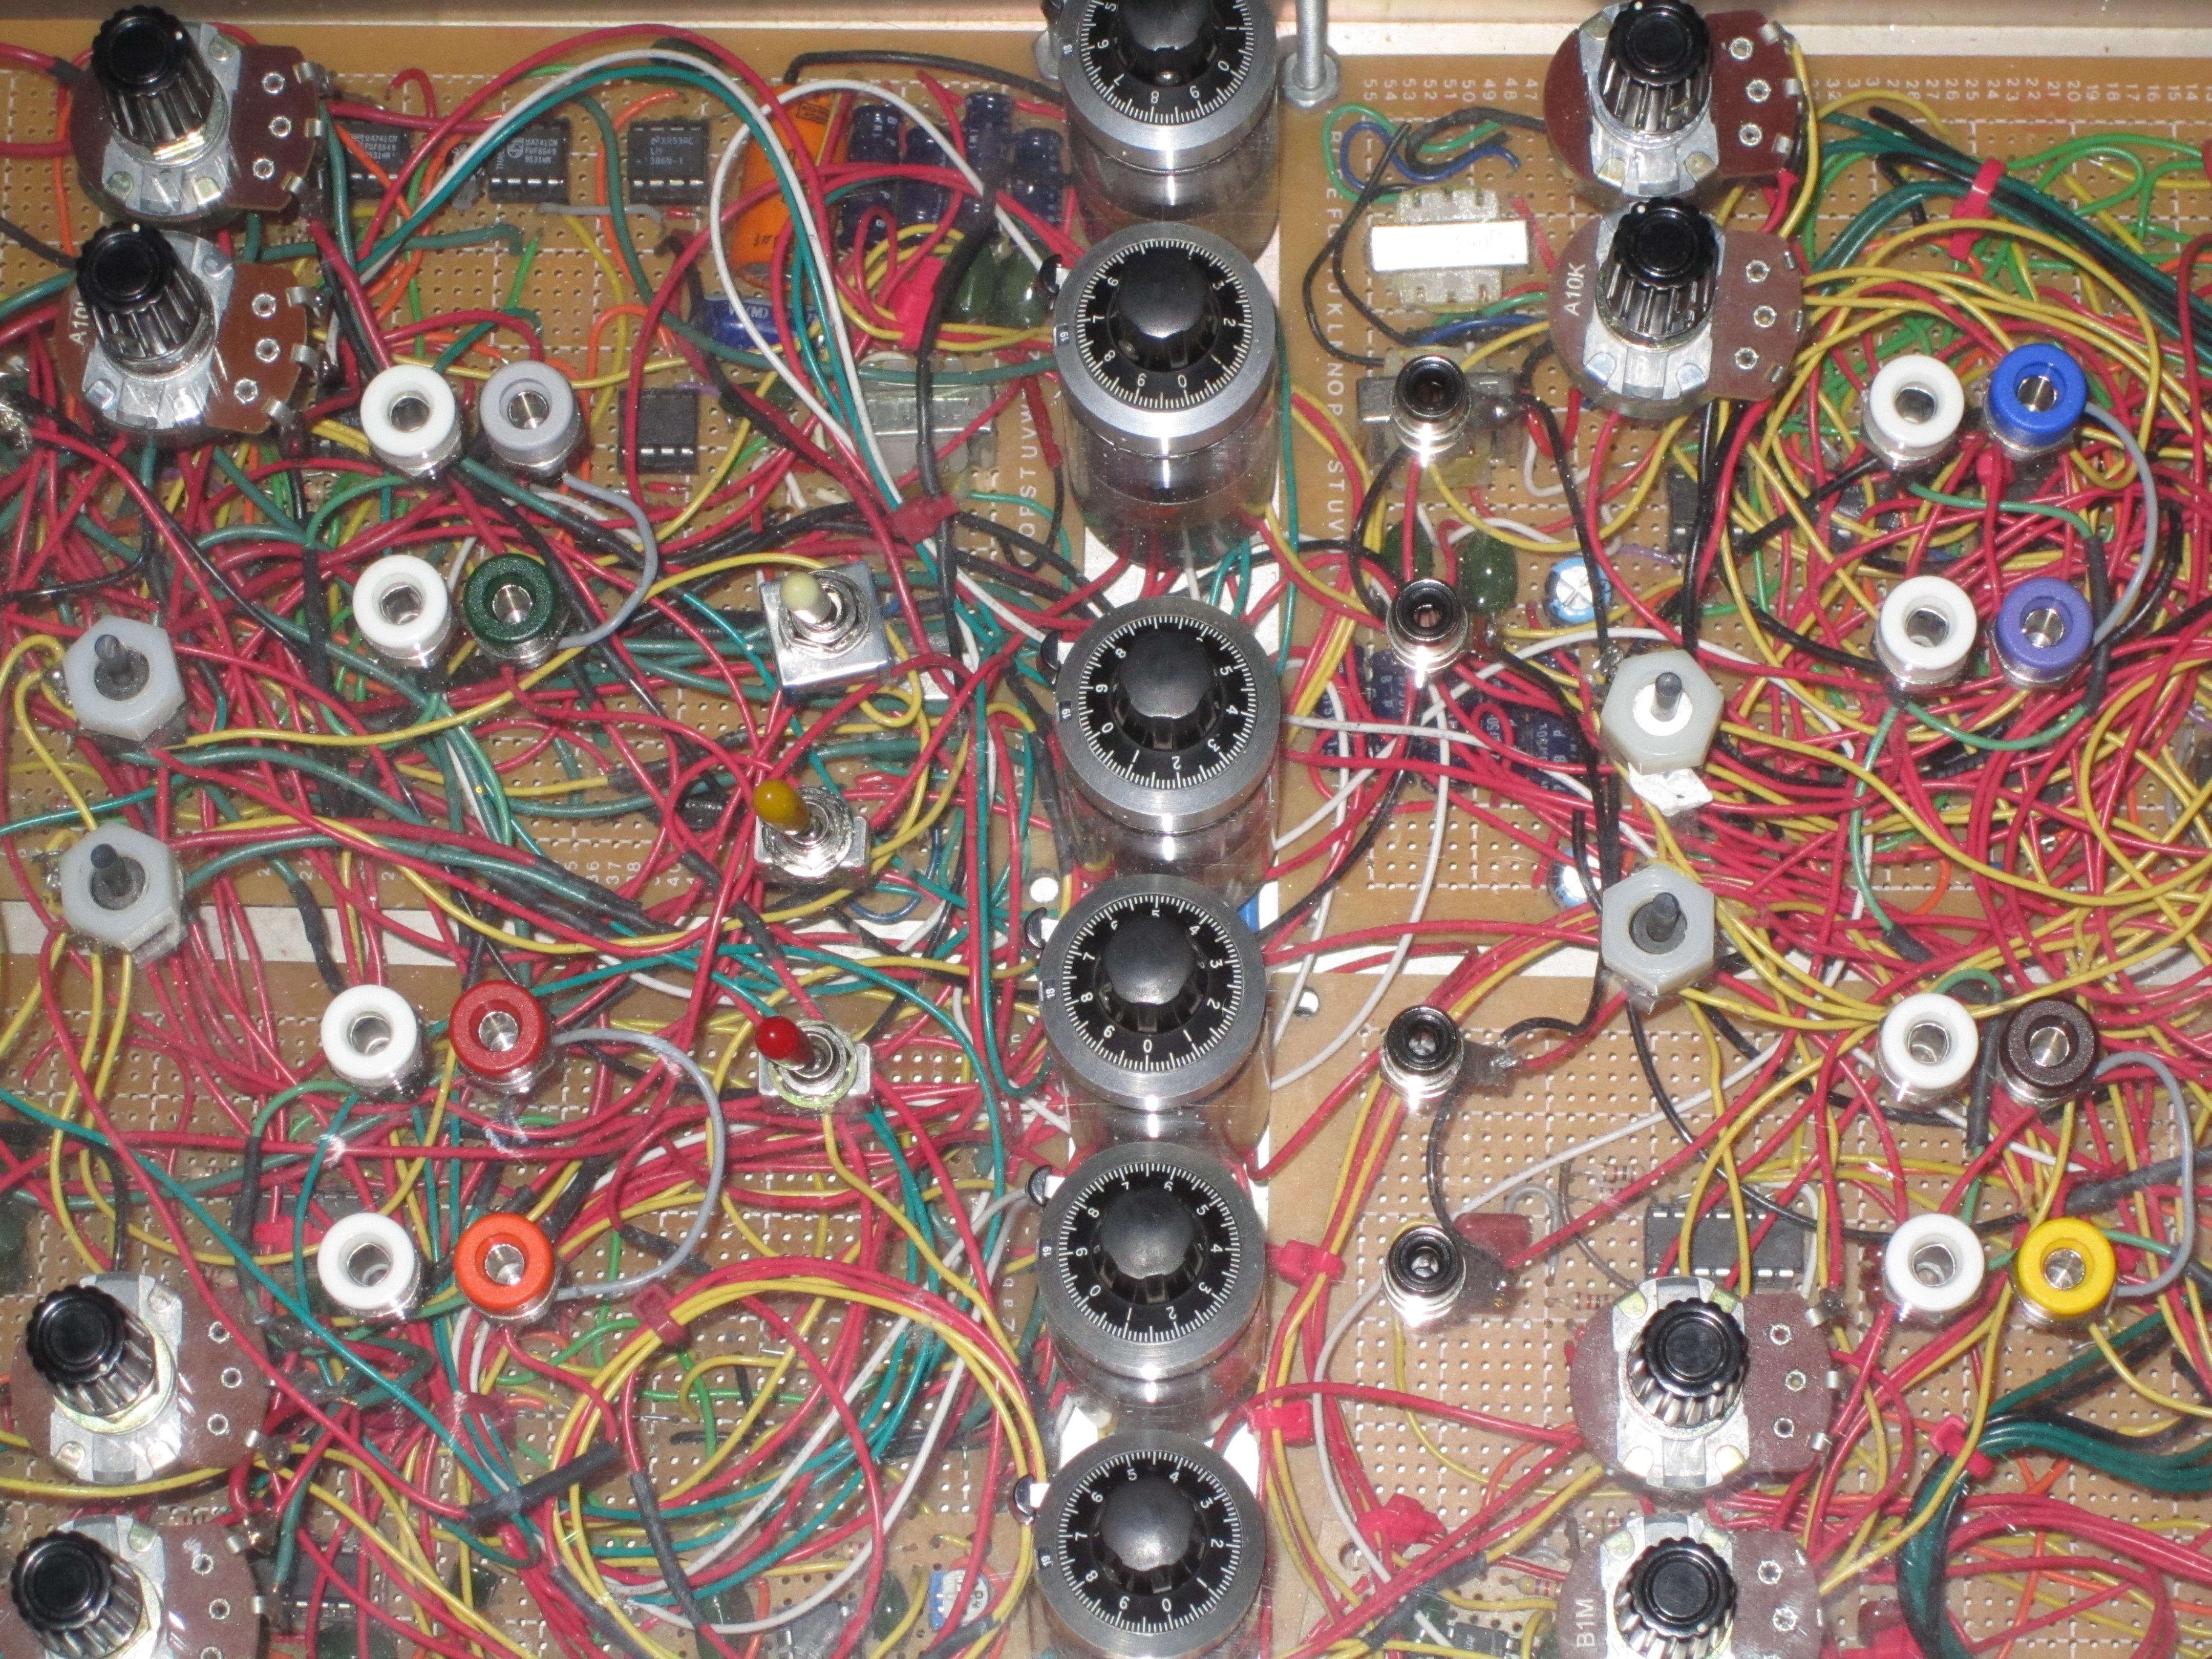 art tec rh iarta unt edu electrical wiring at hot tubs electrical wiring parts list